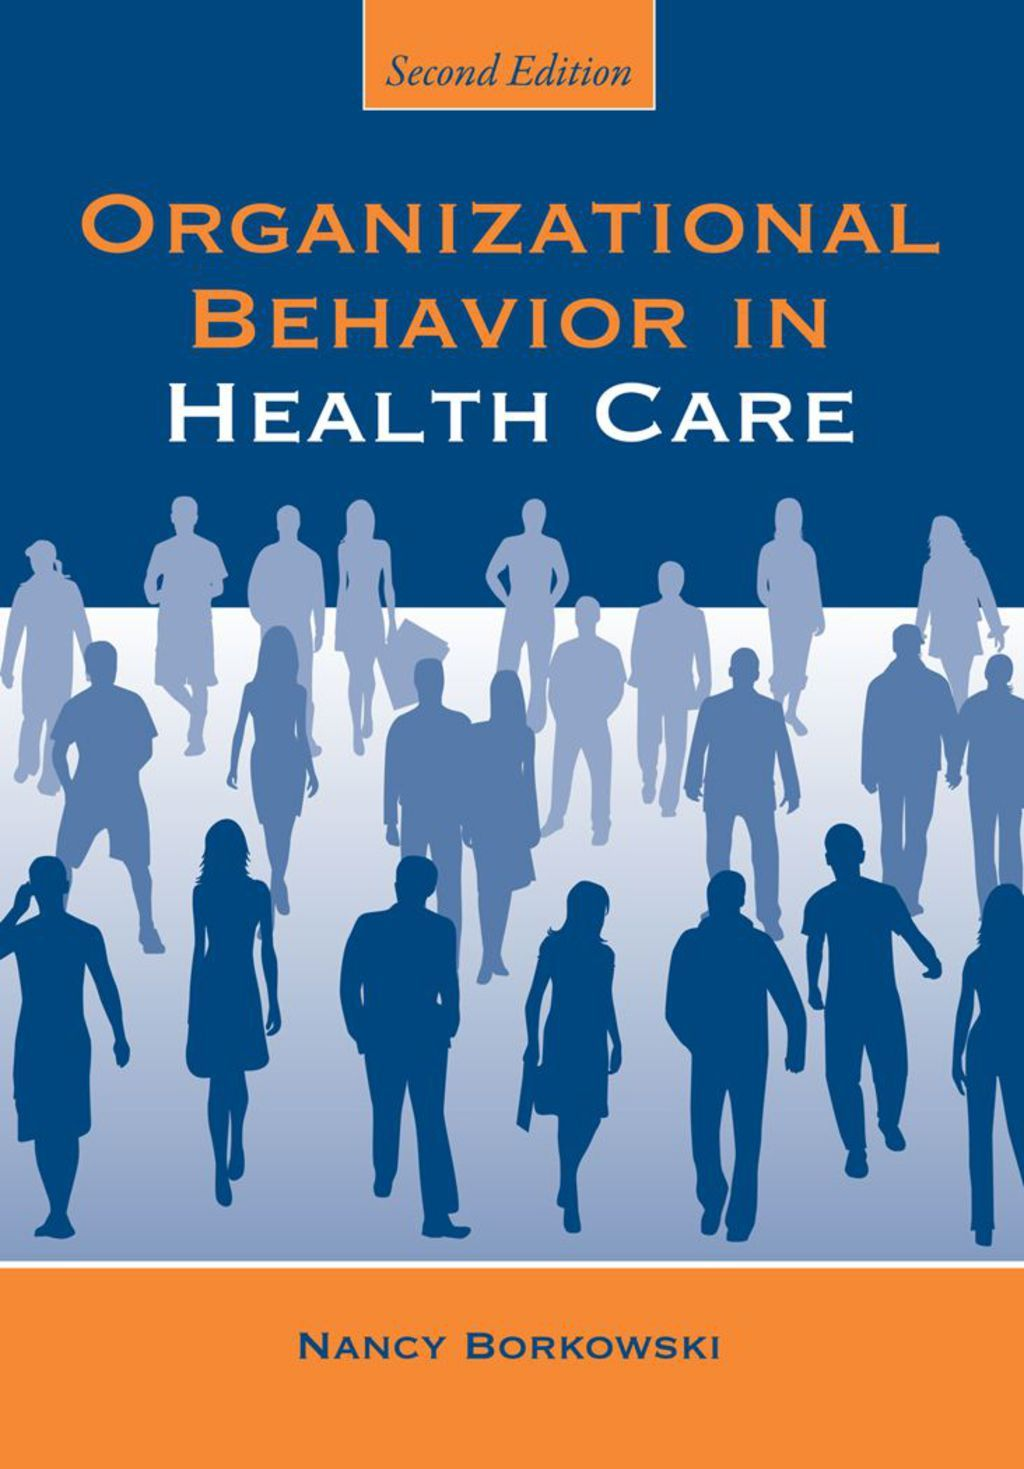 Organizational Behavior in Health Care (eBook Rental